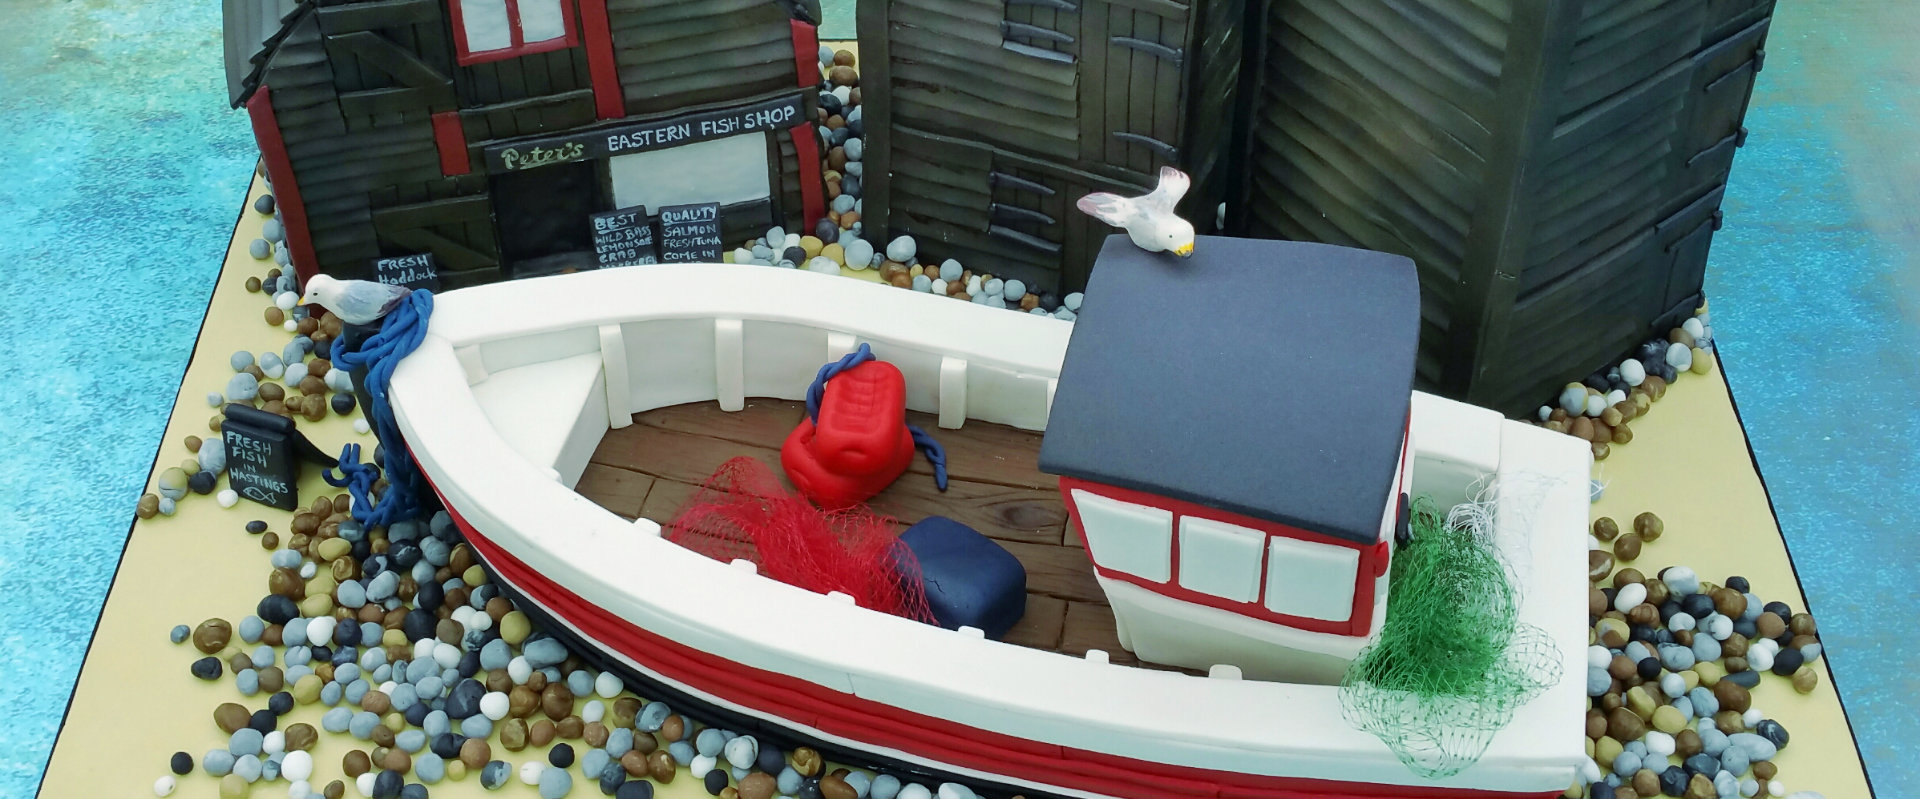 Boat Slide